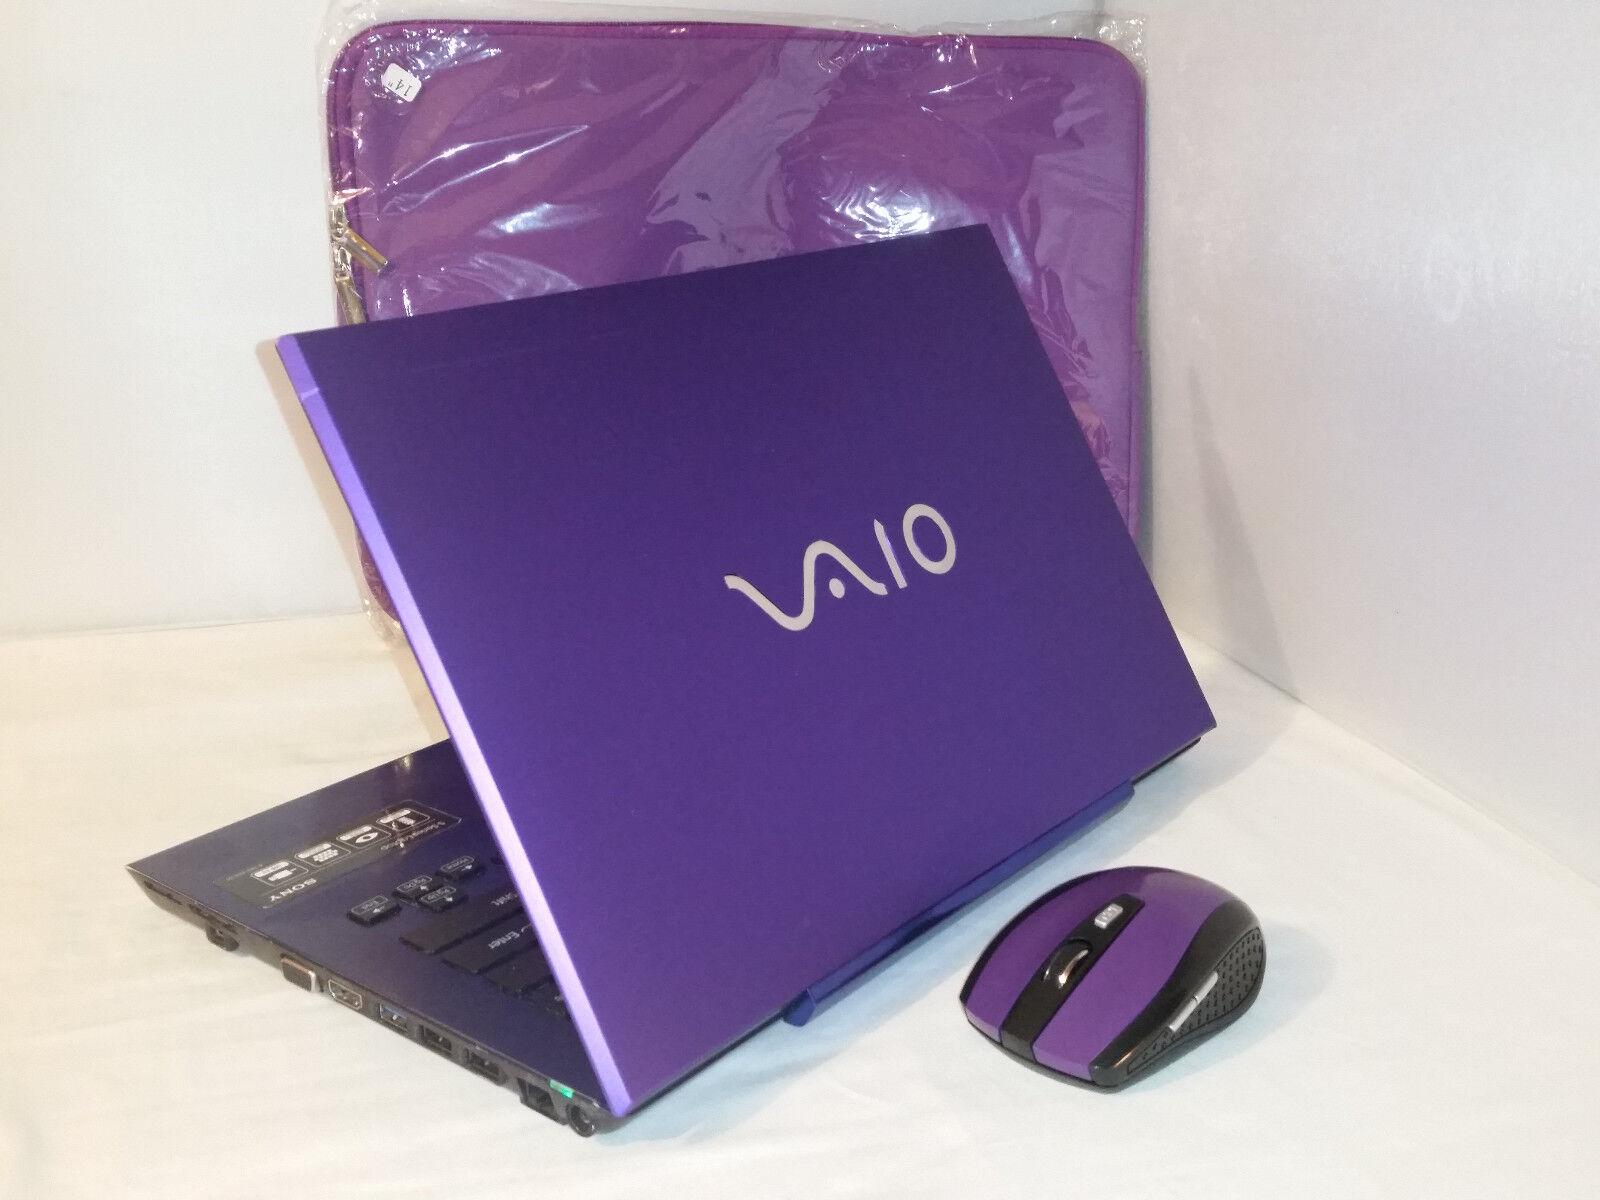 Purple Satin Sony Vaio VPCSB11FX 2tb 4gb 2.30GHz i5 Windows 10 Office 2016